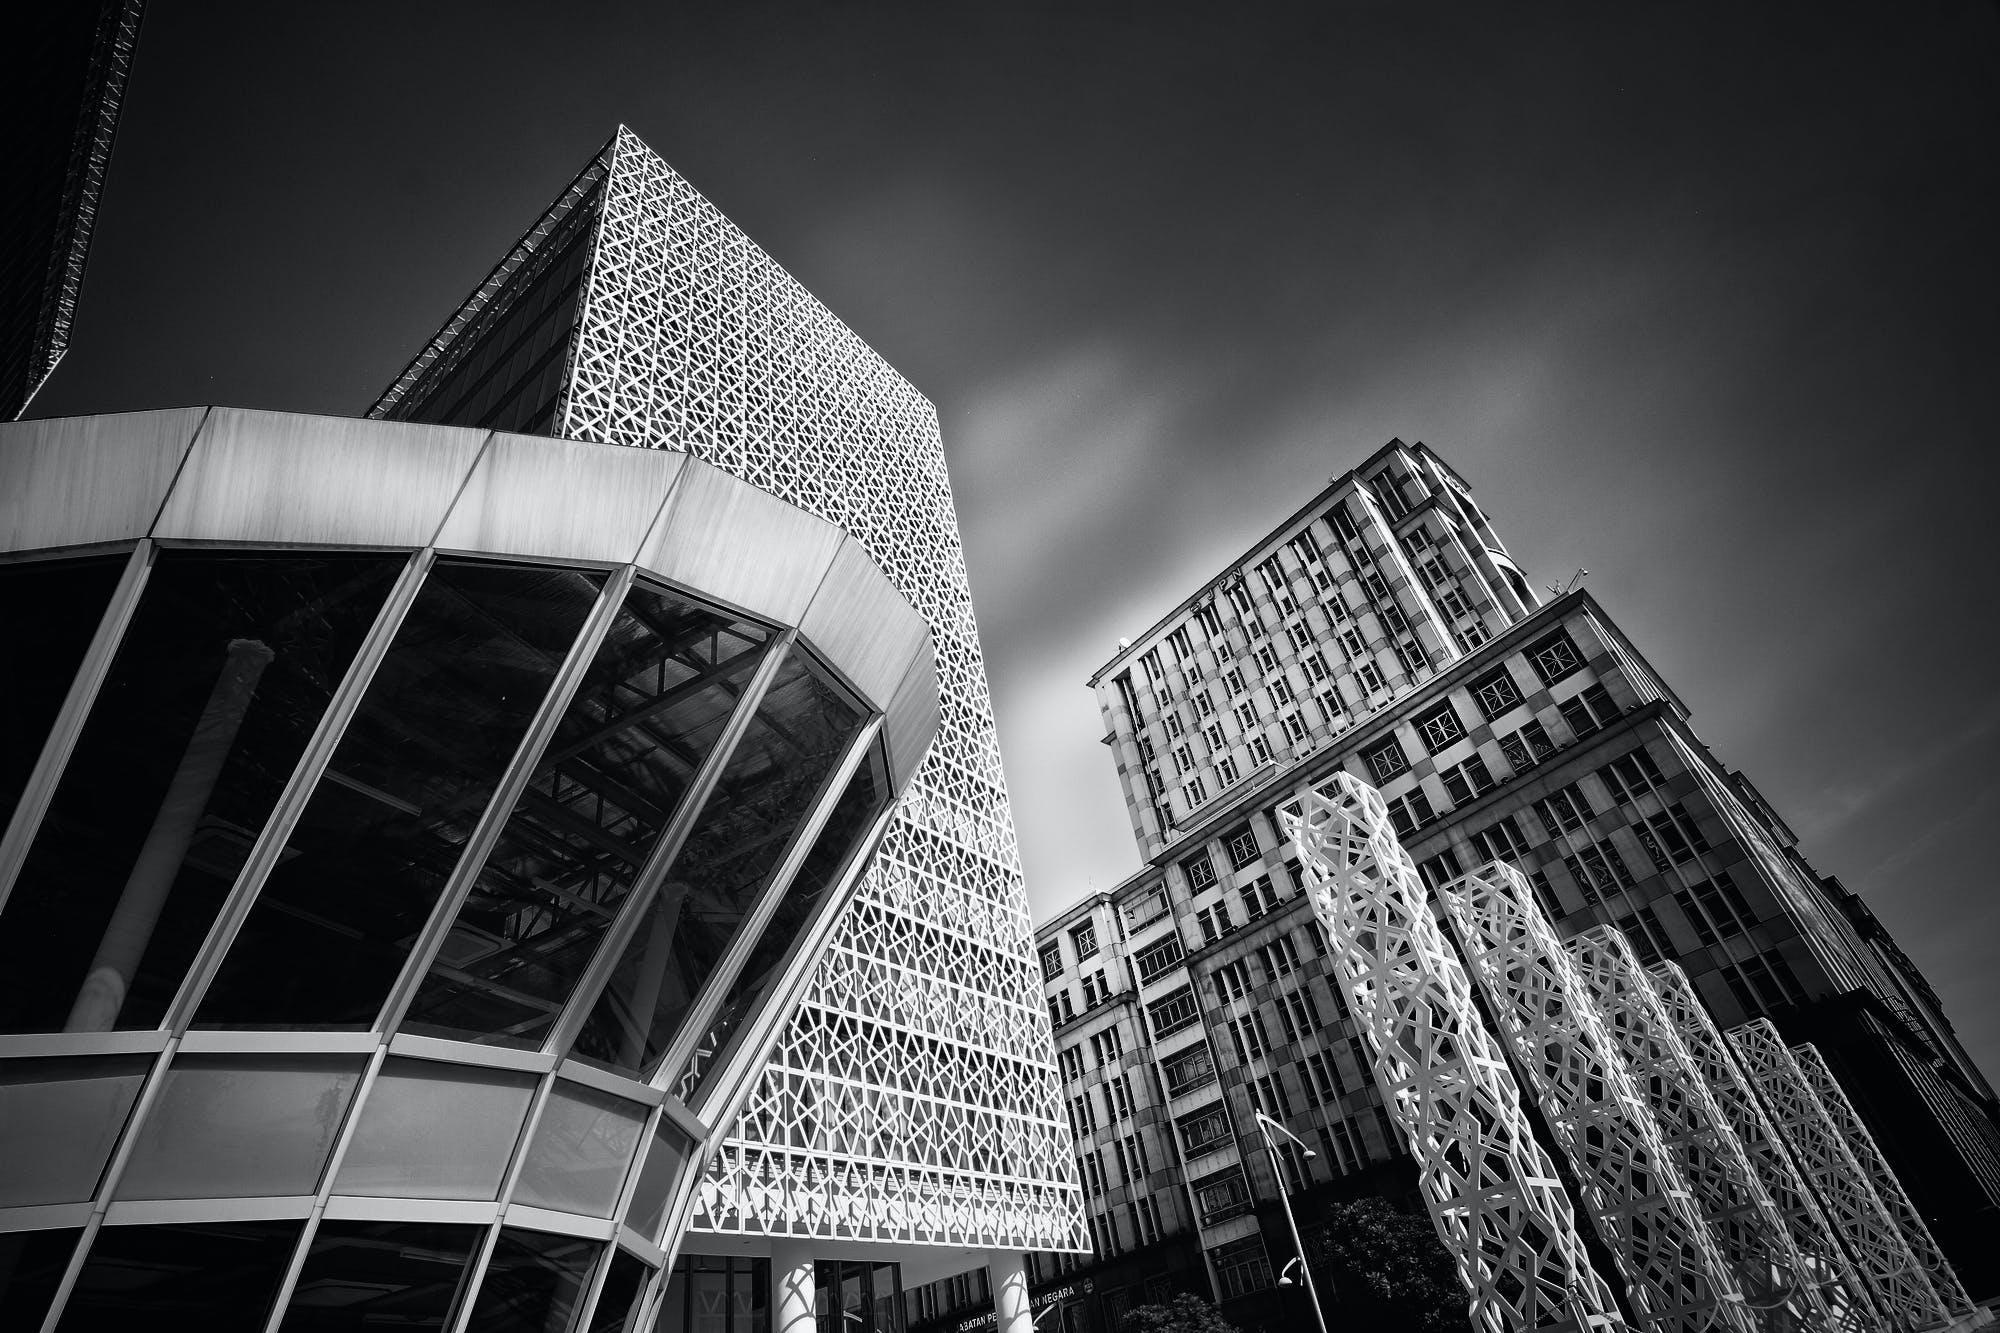 Worm's Eye View Buildings